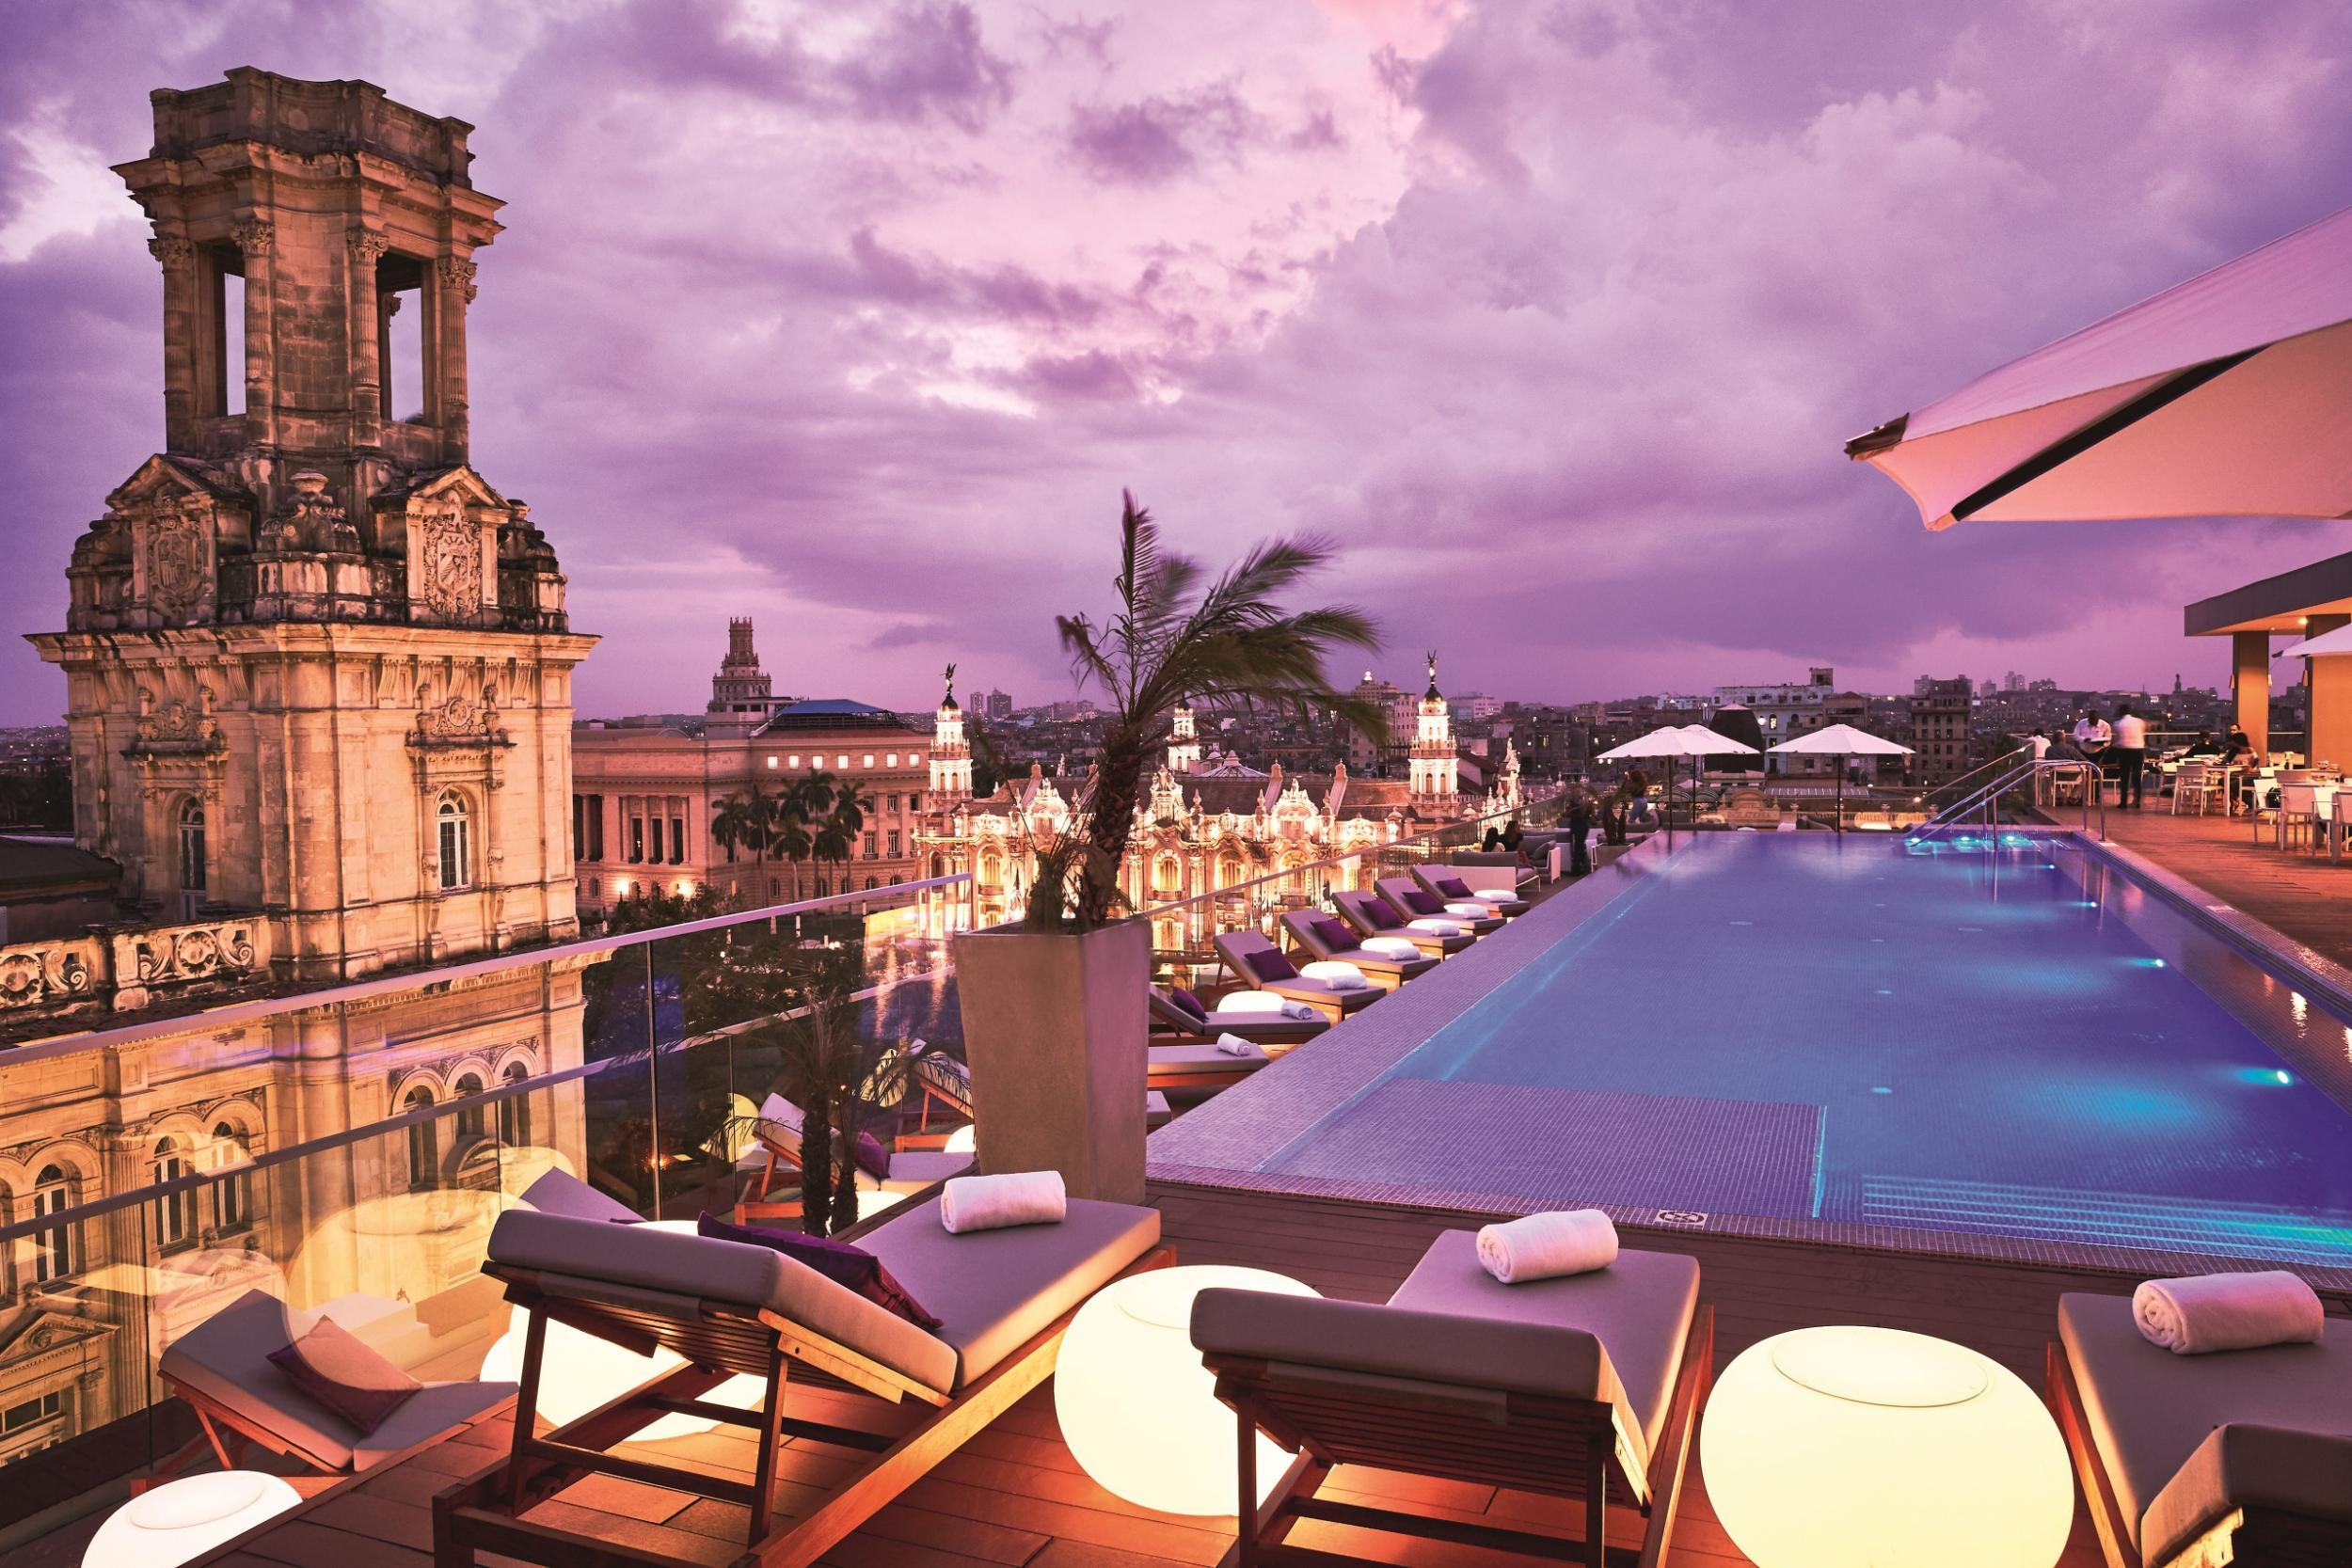 Gran hotel manzana kempinski review the five star resort for 5 star cuban hotels